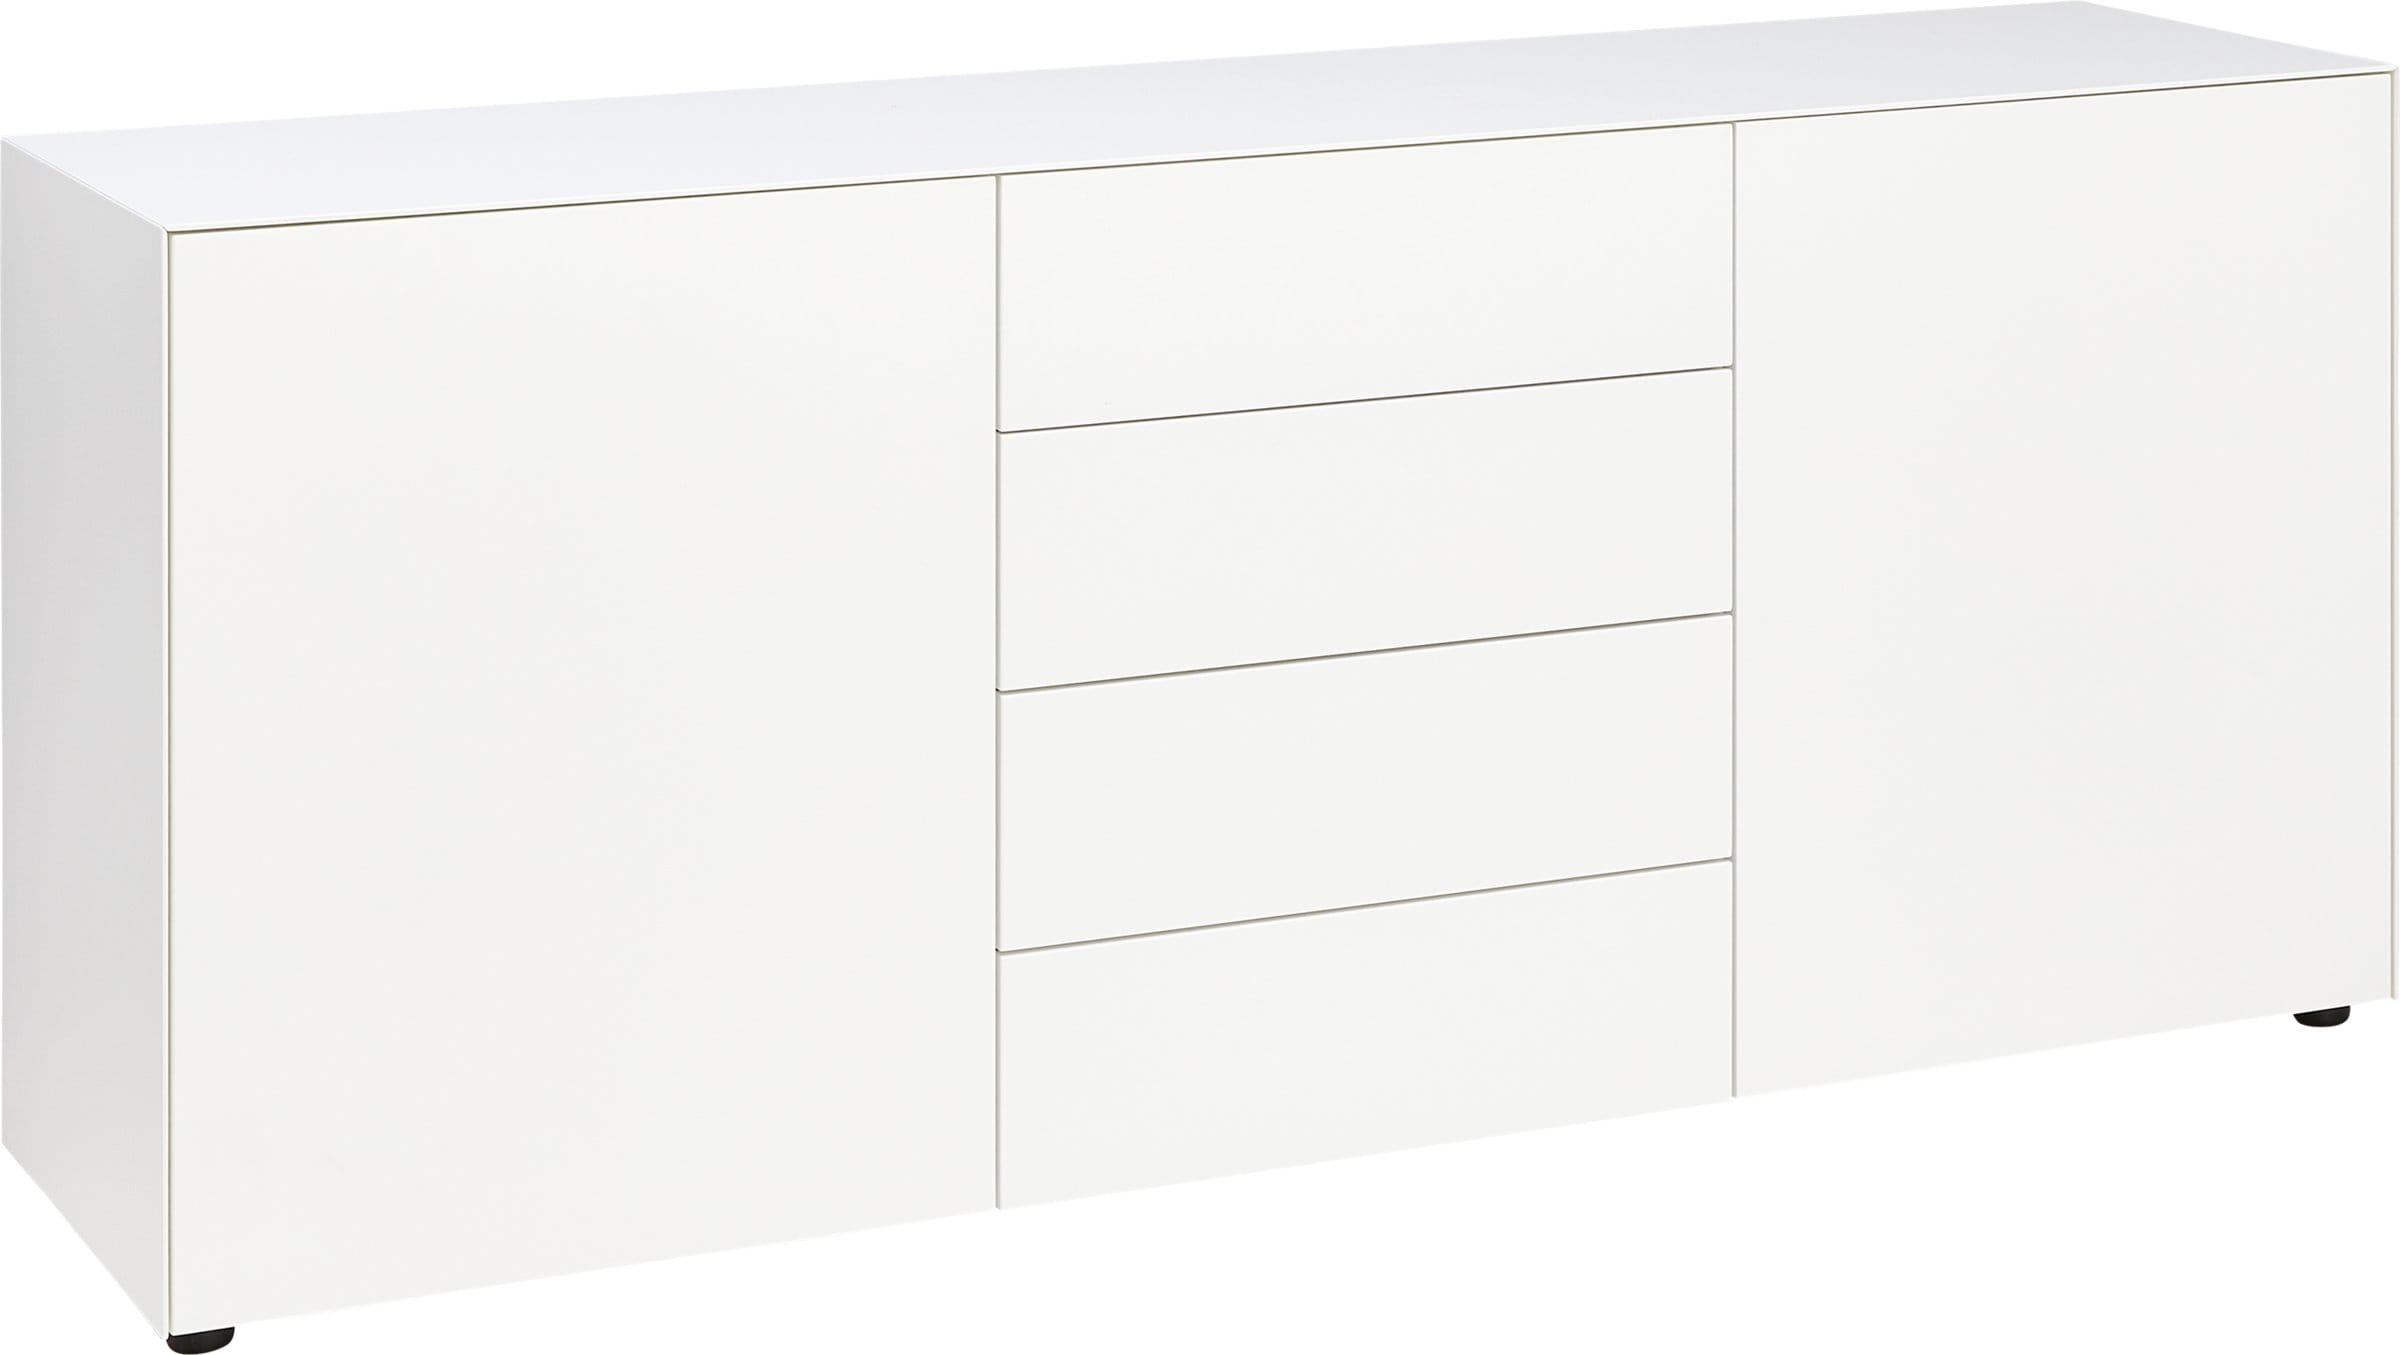 LUX Sideboard